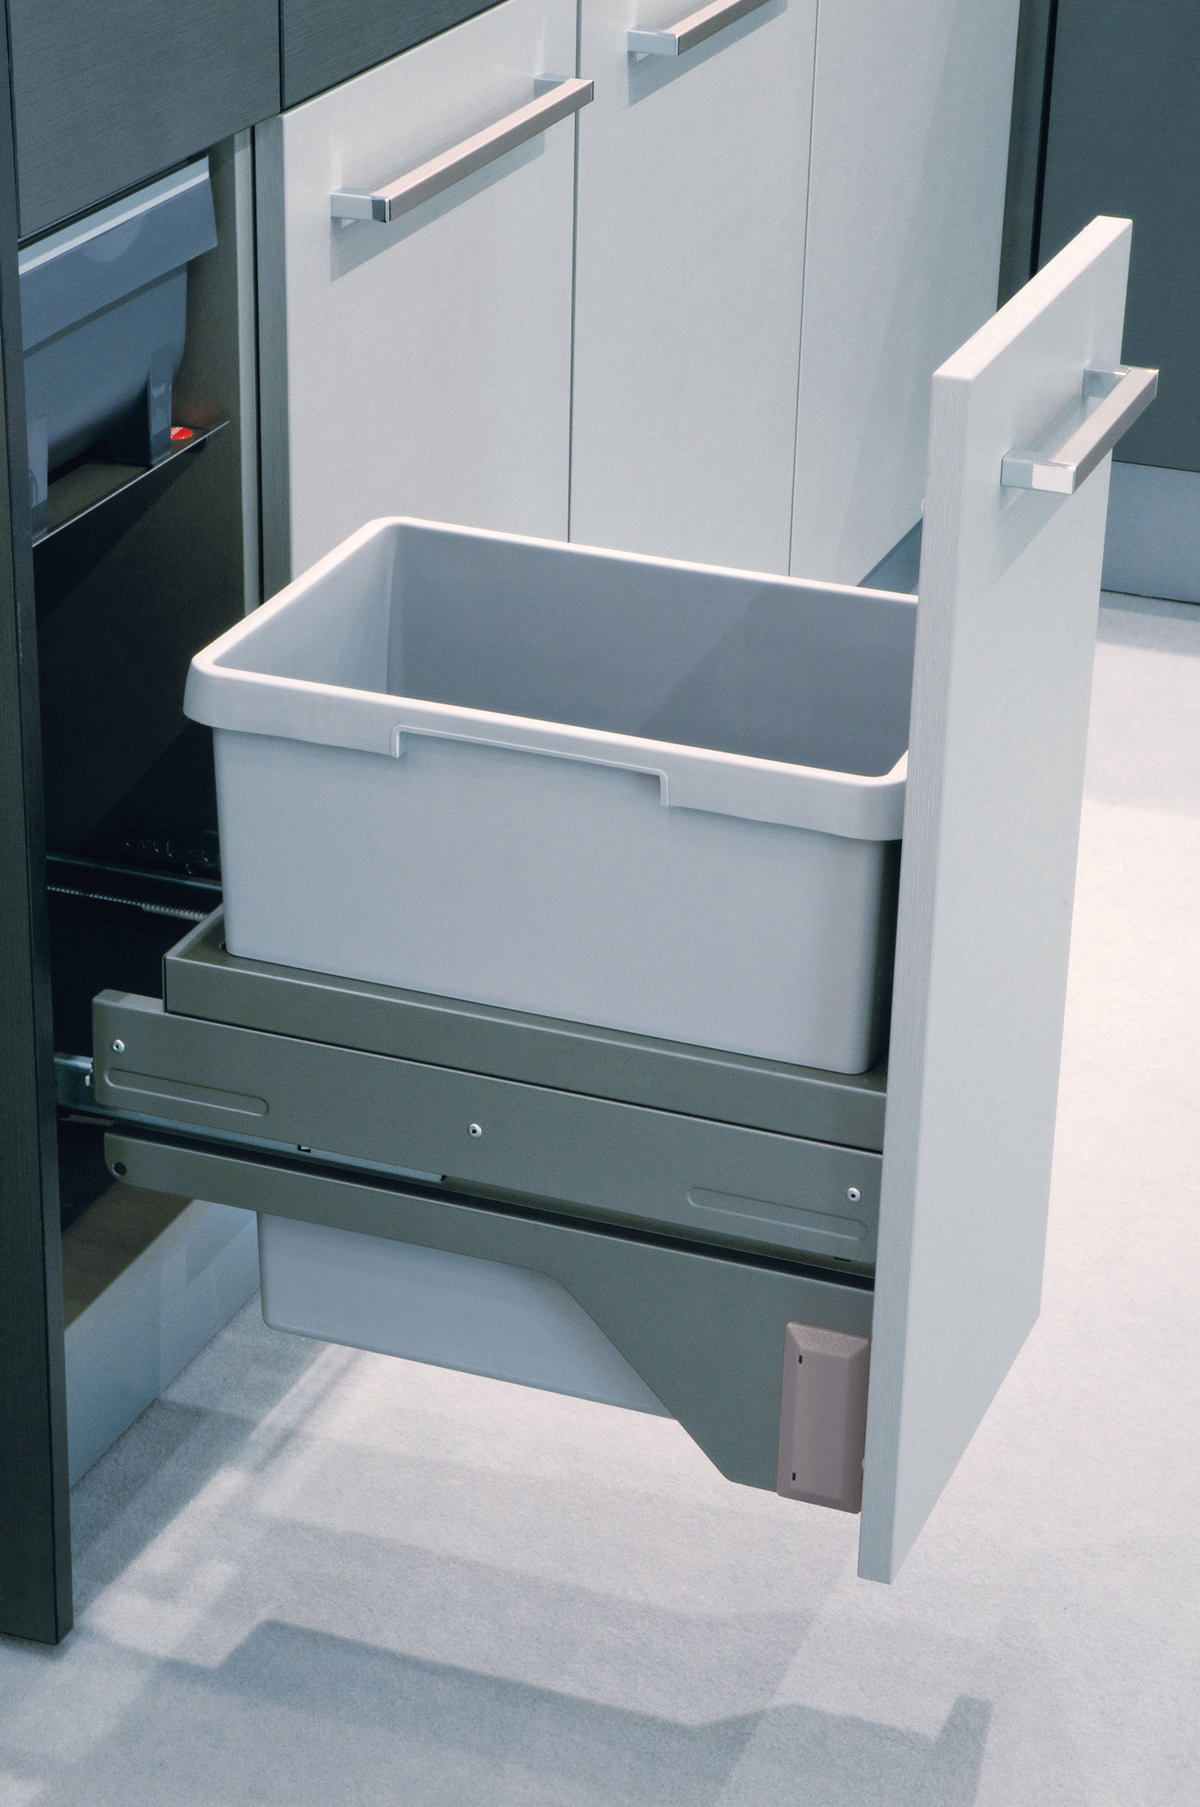 Hafele 502.73.900 Trash Can, Gray | TheBuildersSupply.com